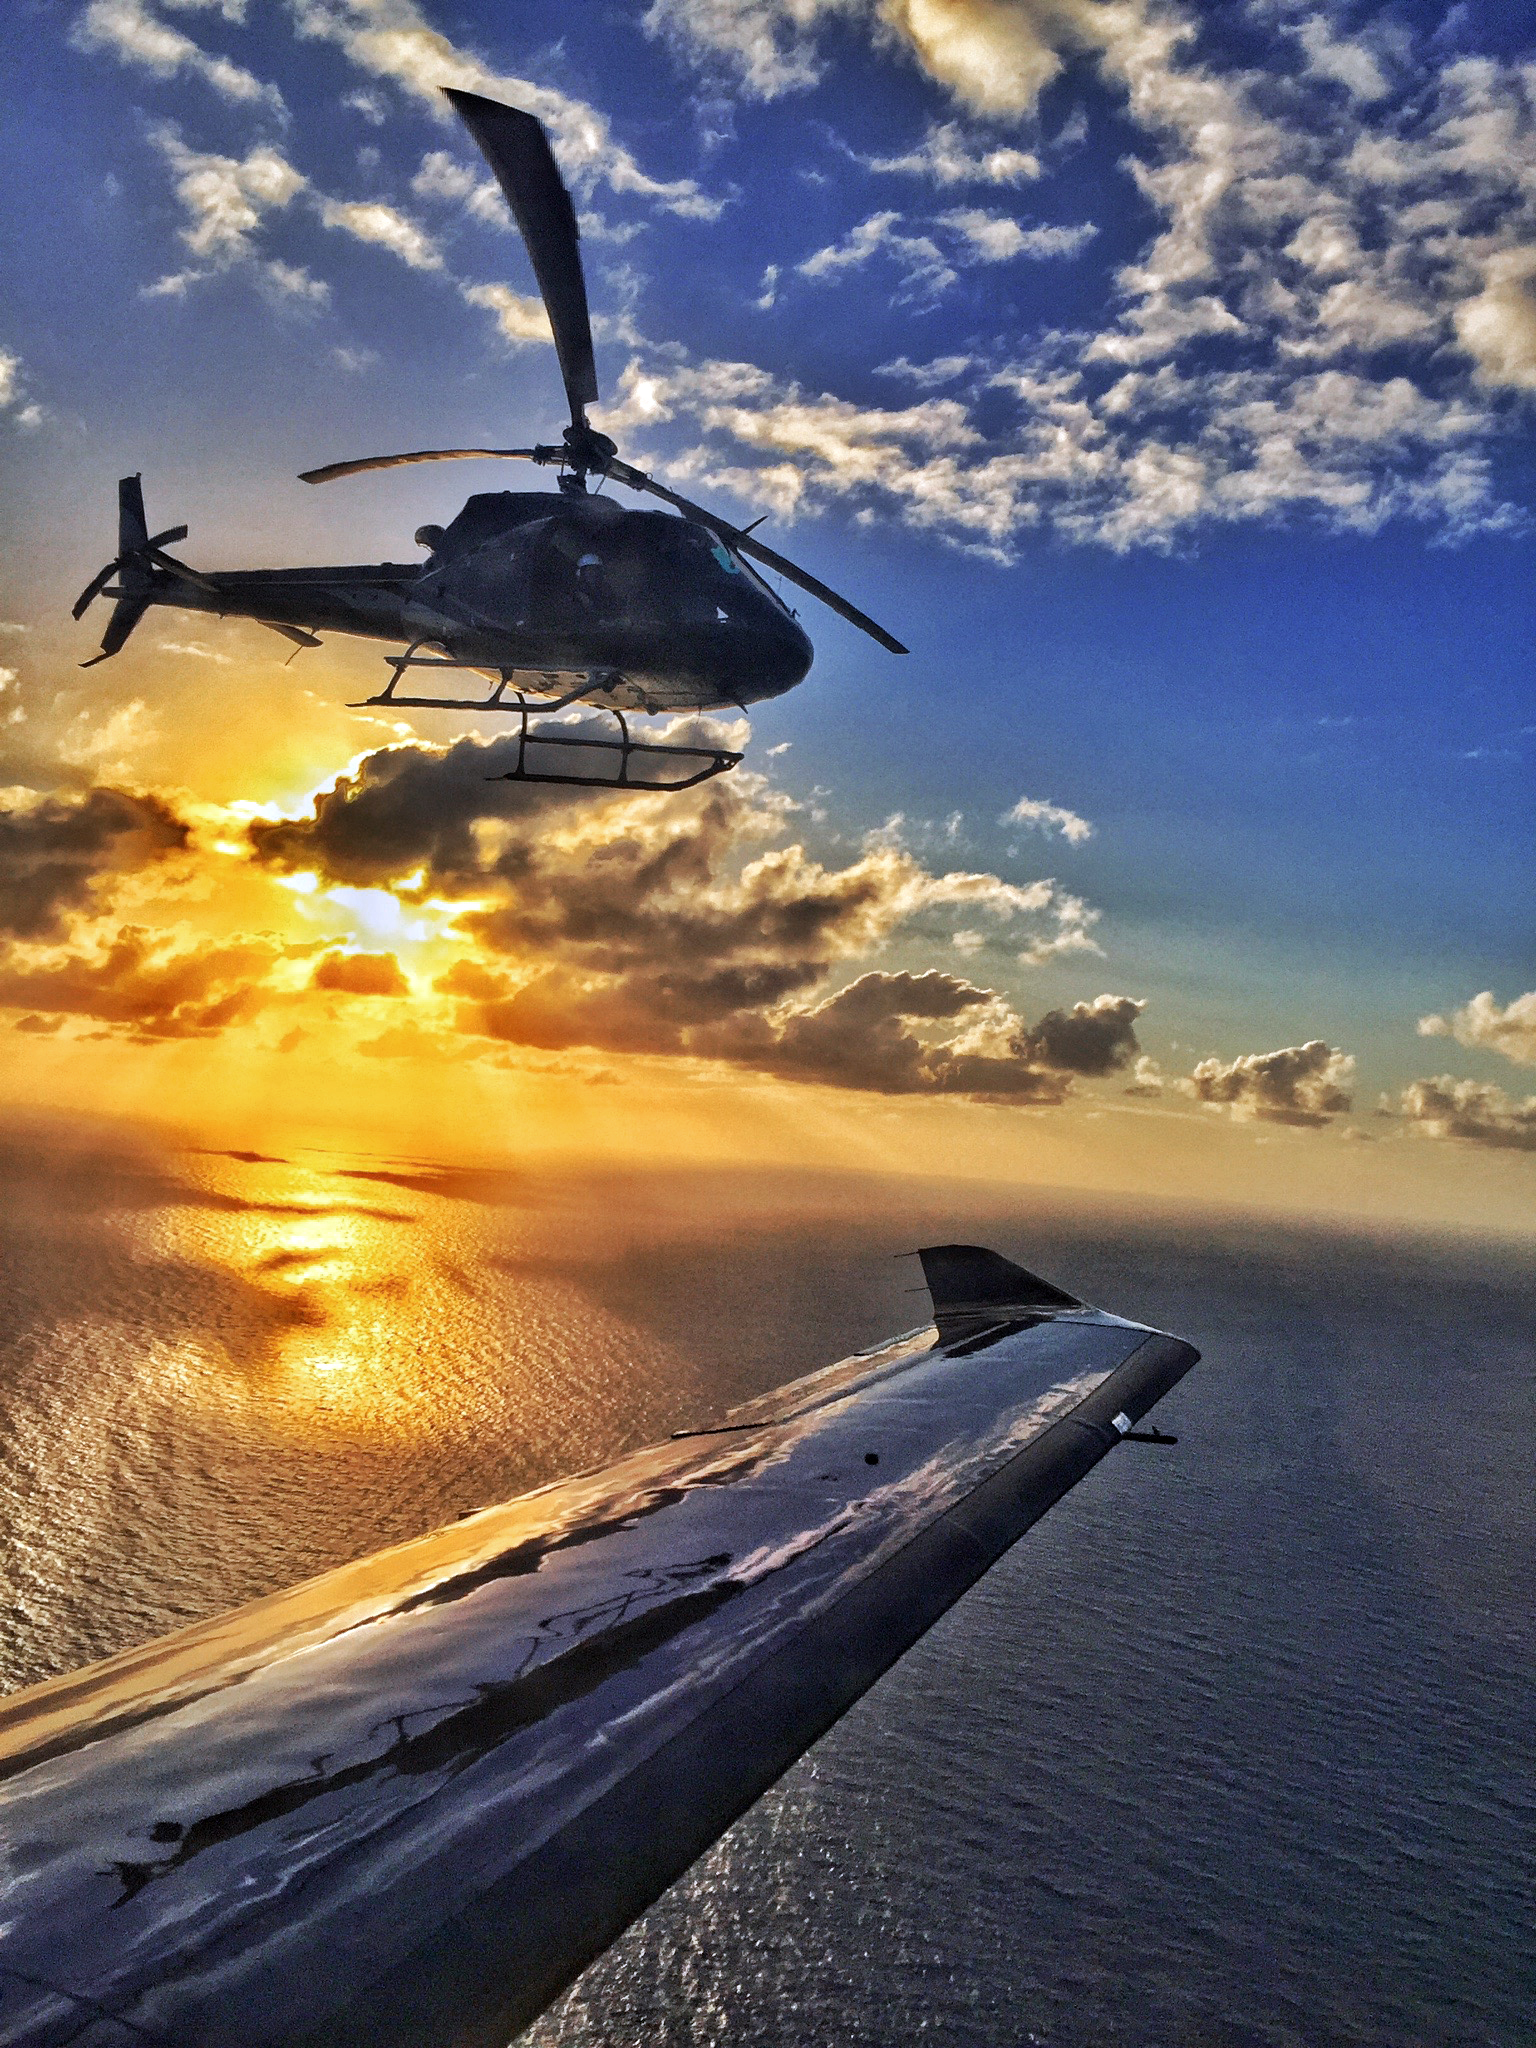 Jon and Davids AS350 helicopter, taken by Pilatus pilot Sebastian Lip